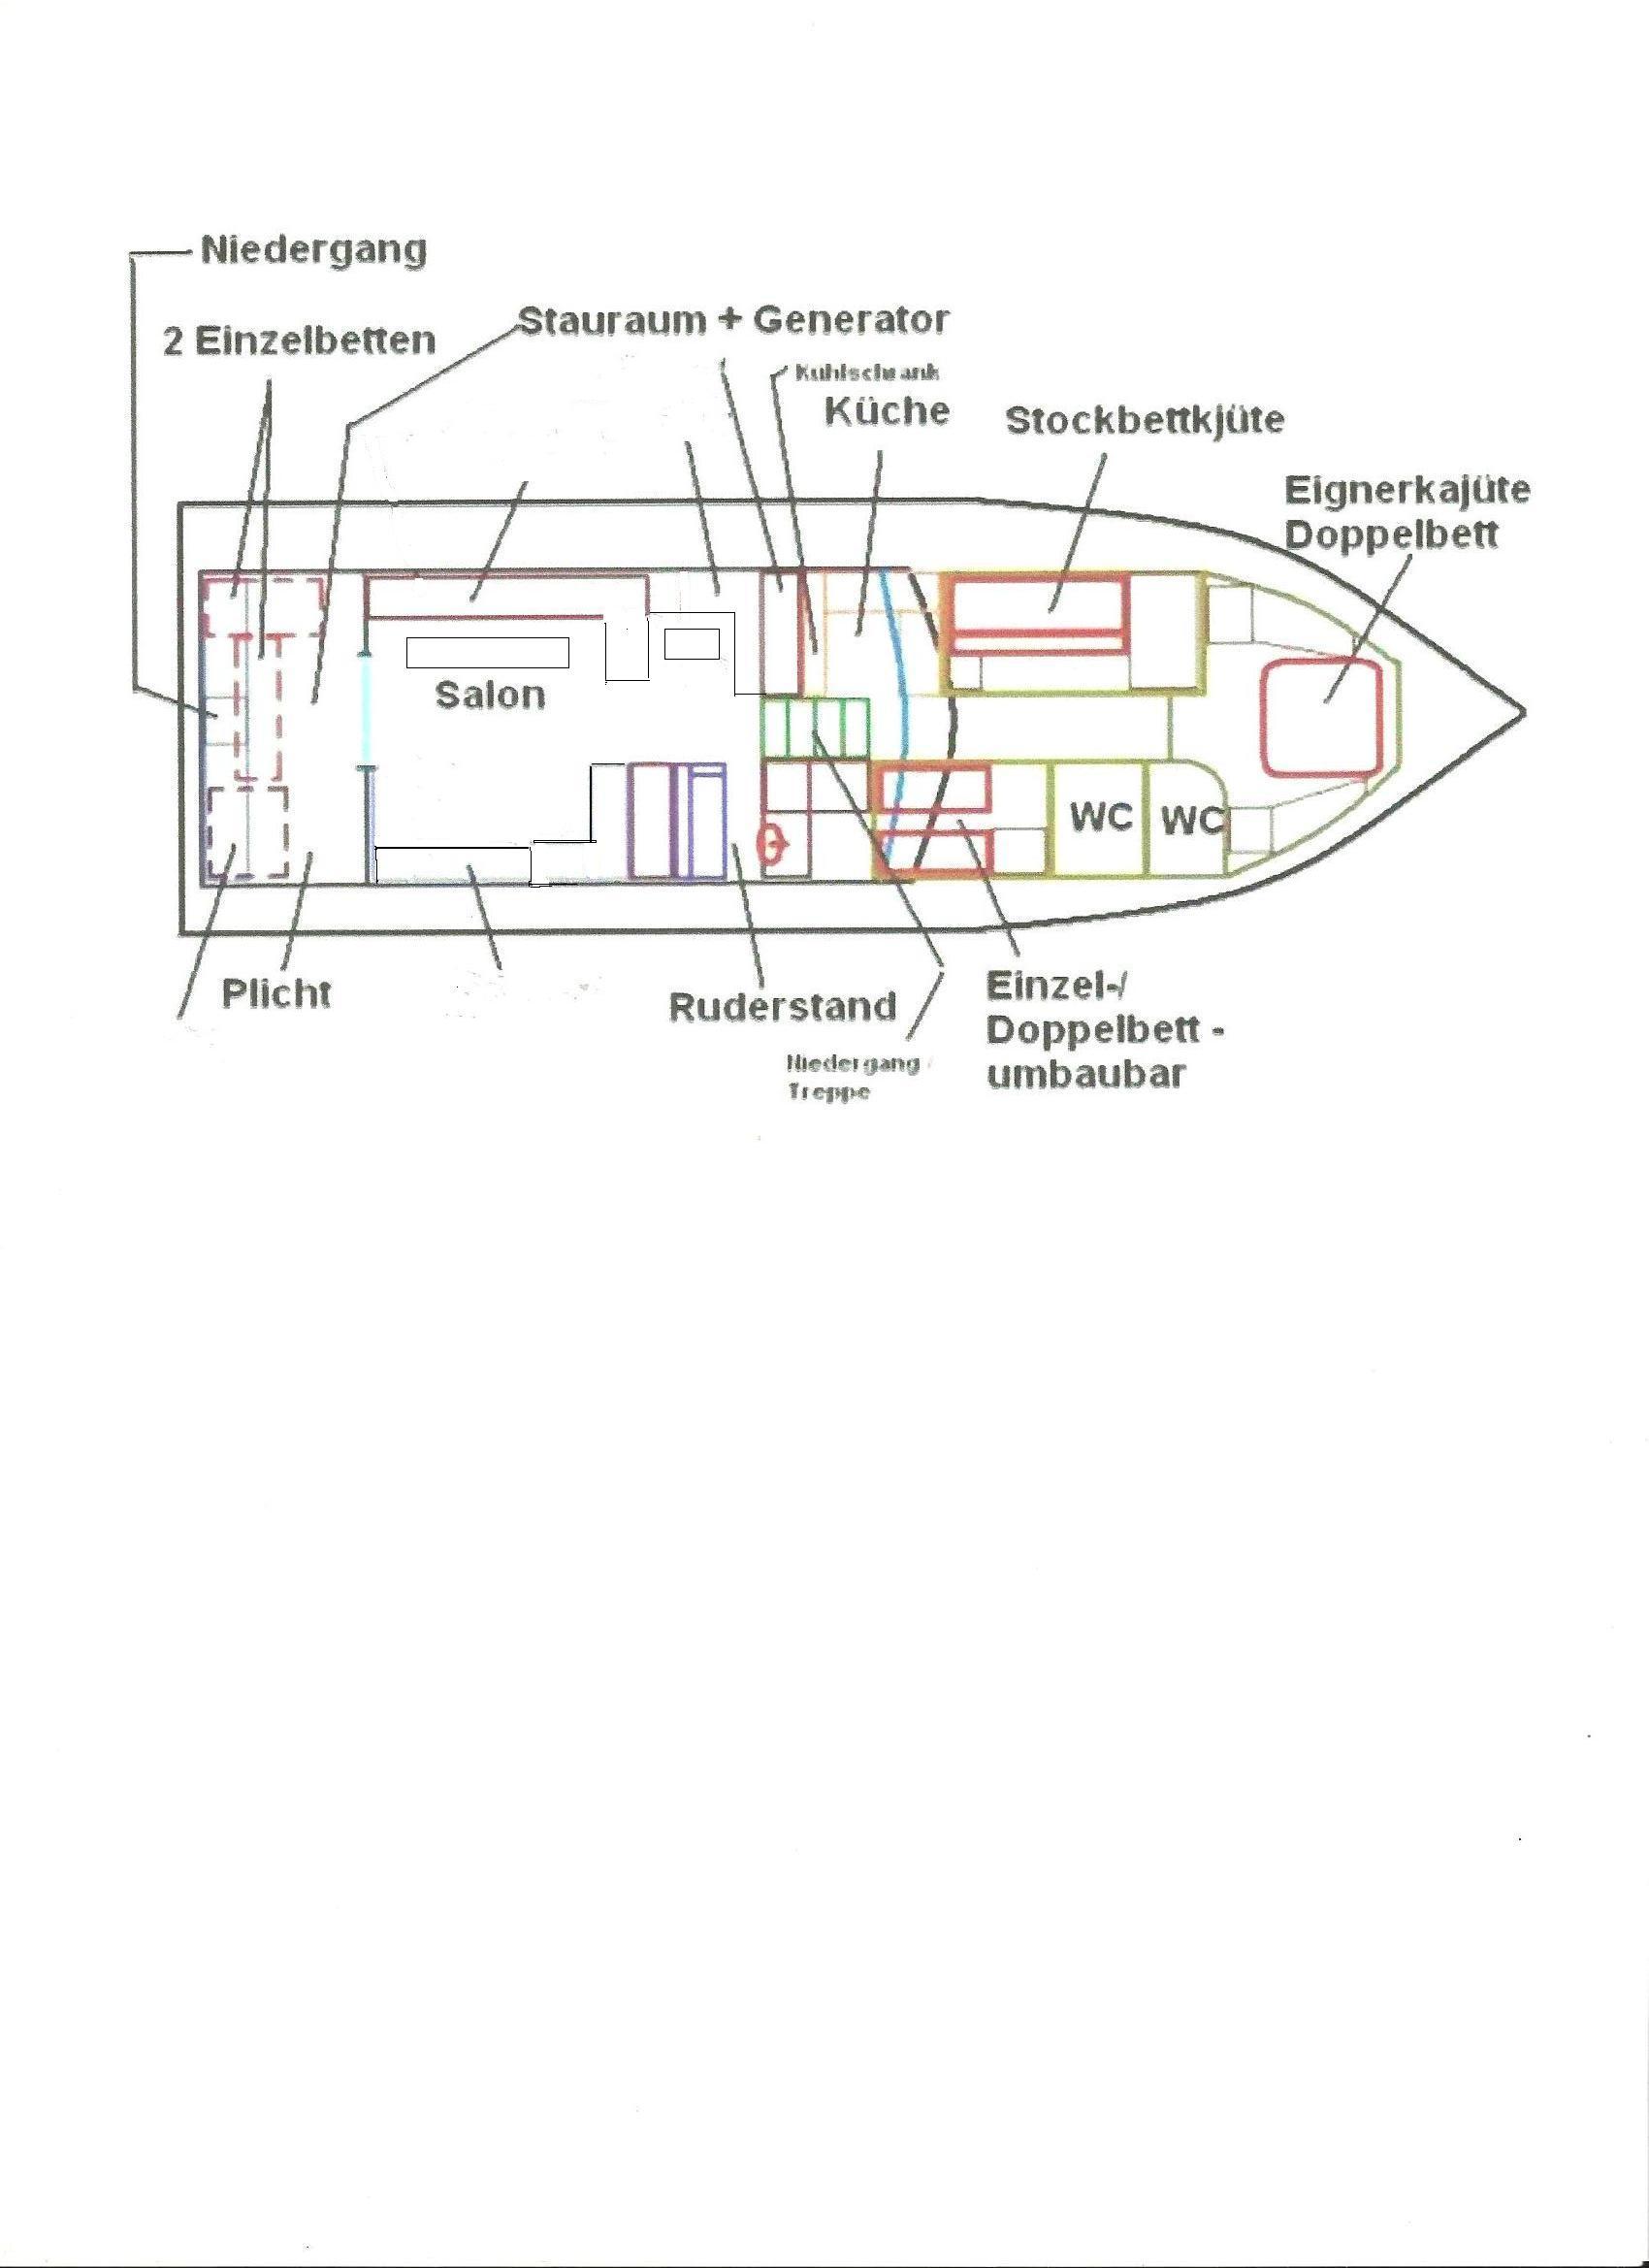 Charmant Hampton Bay Decke Fan Licht Schaltplan Ideen - Schaltplan ...